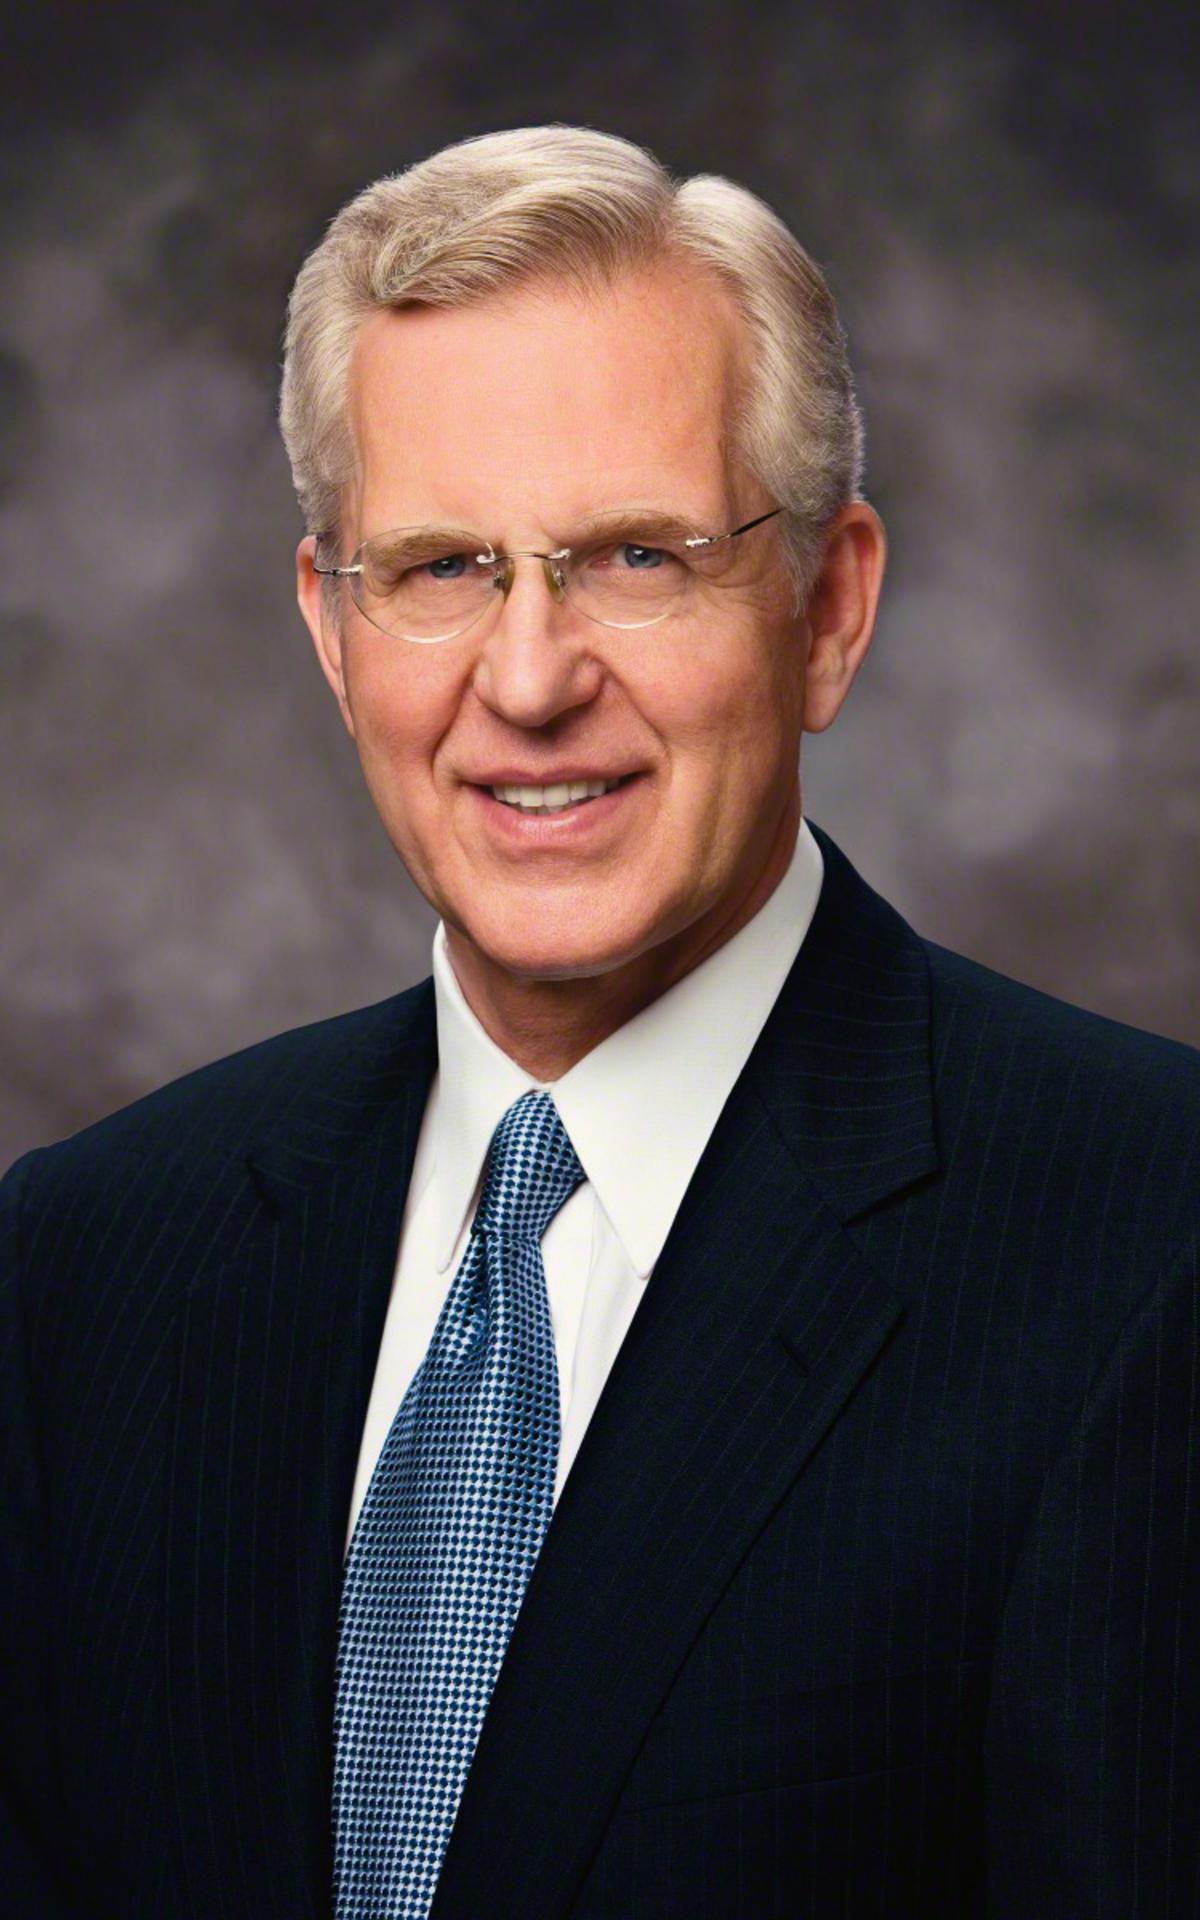 D. Todd Christofferson apostolo mormoni.jpg